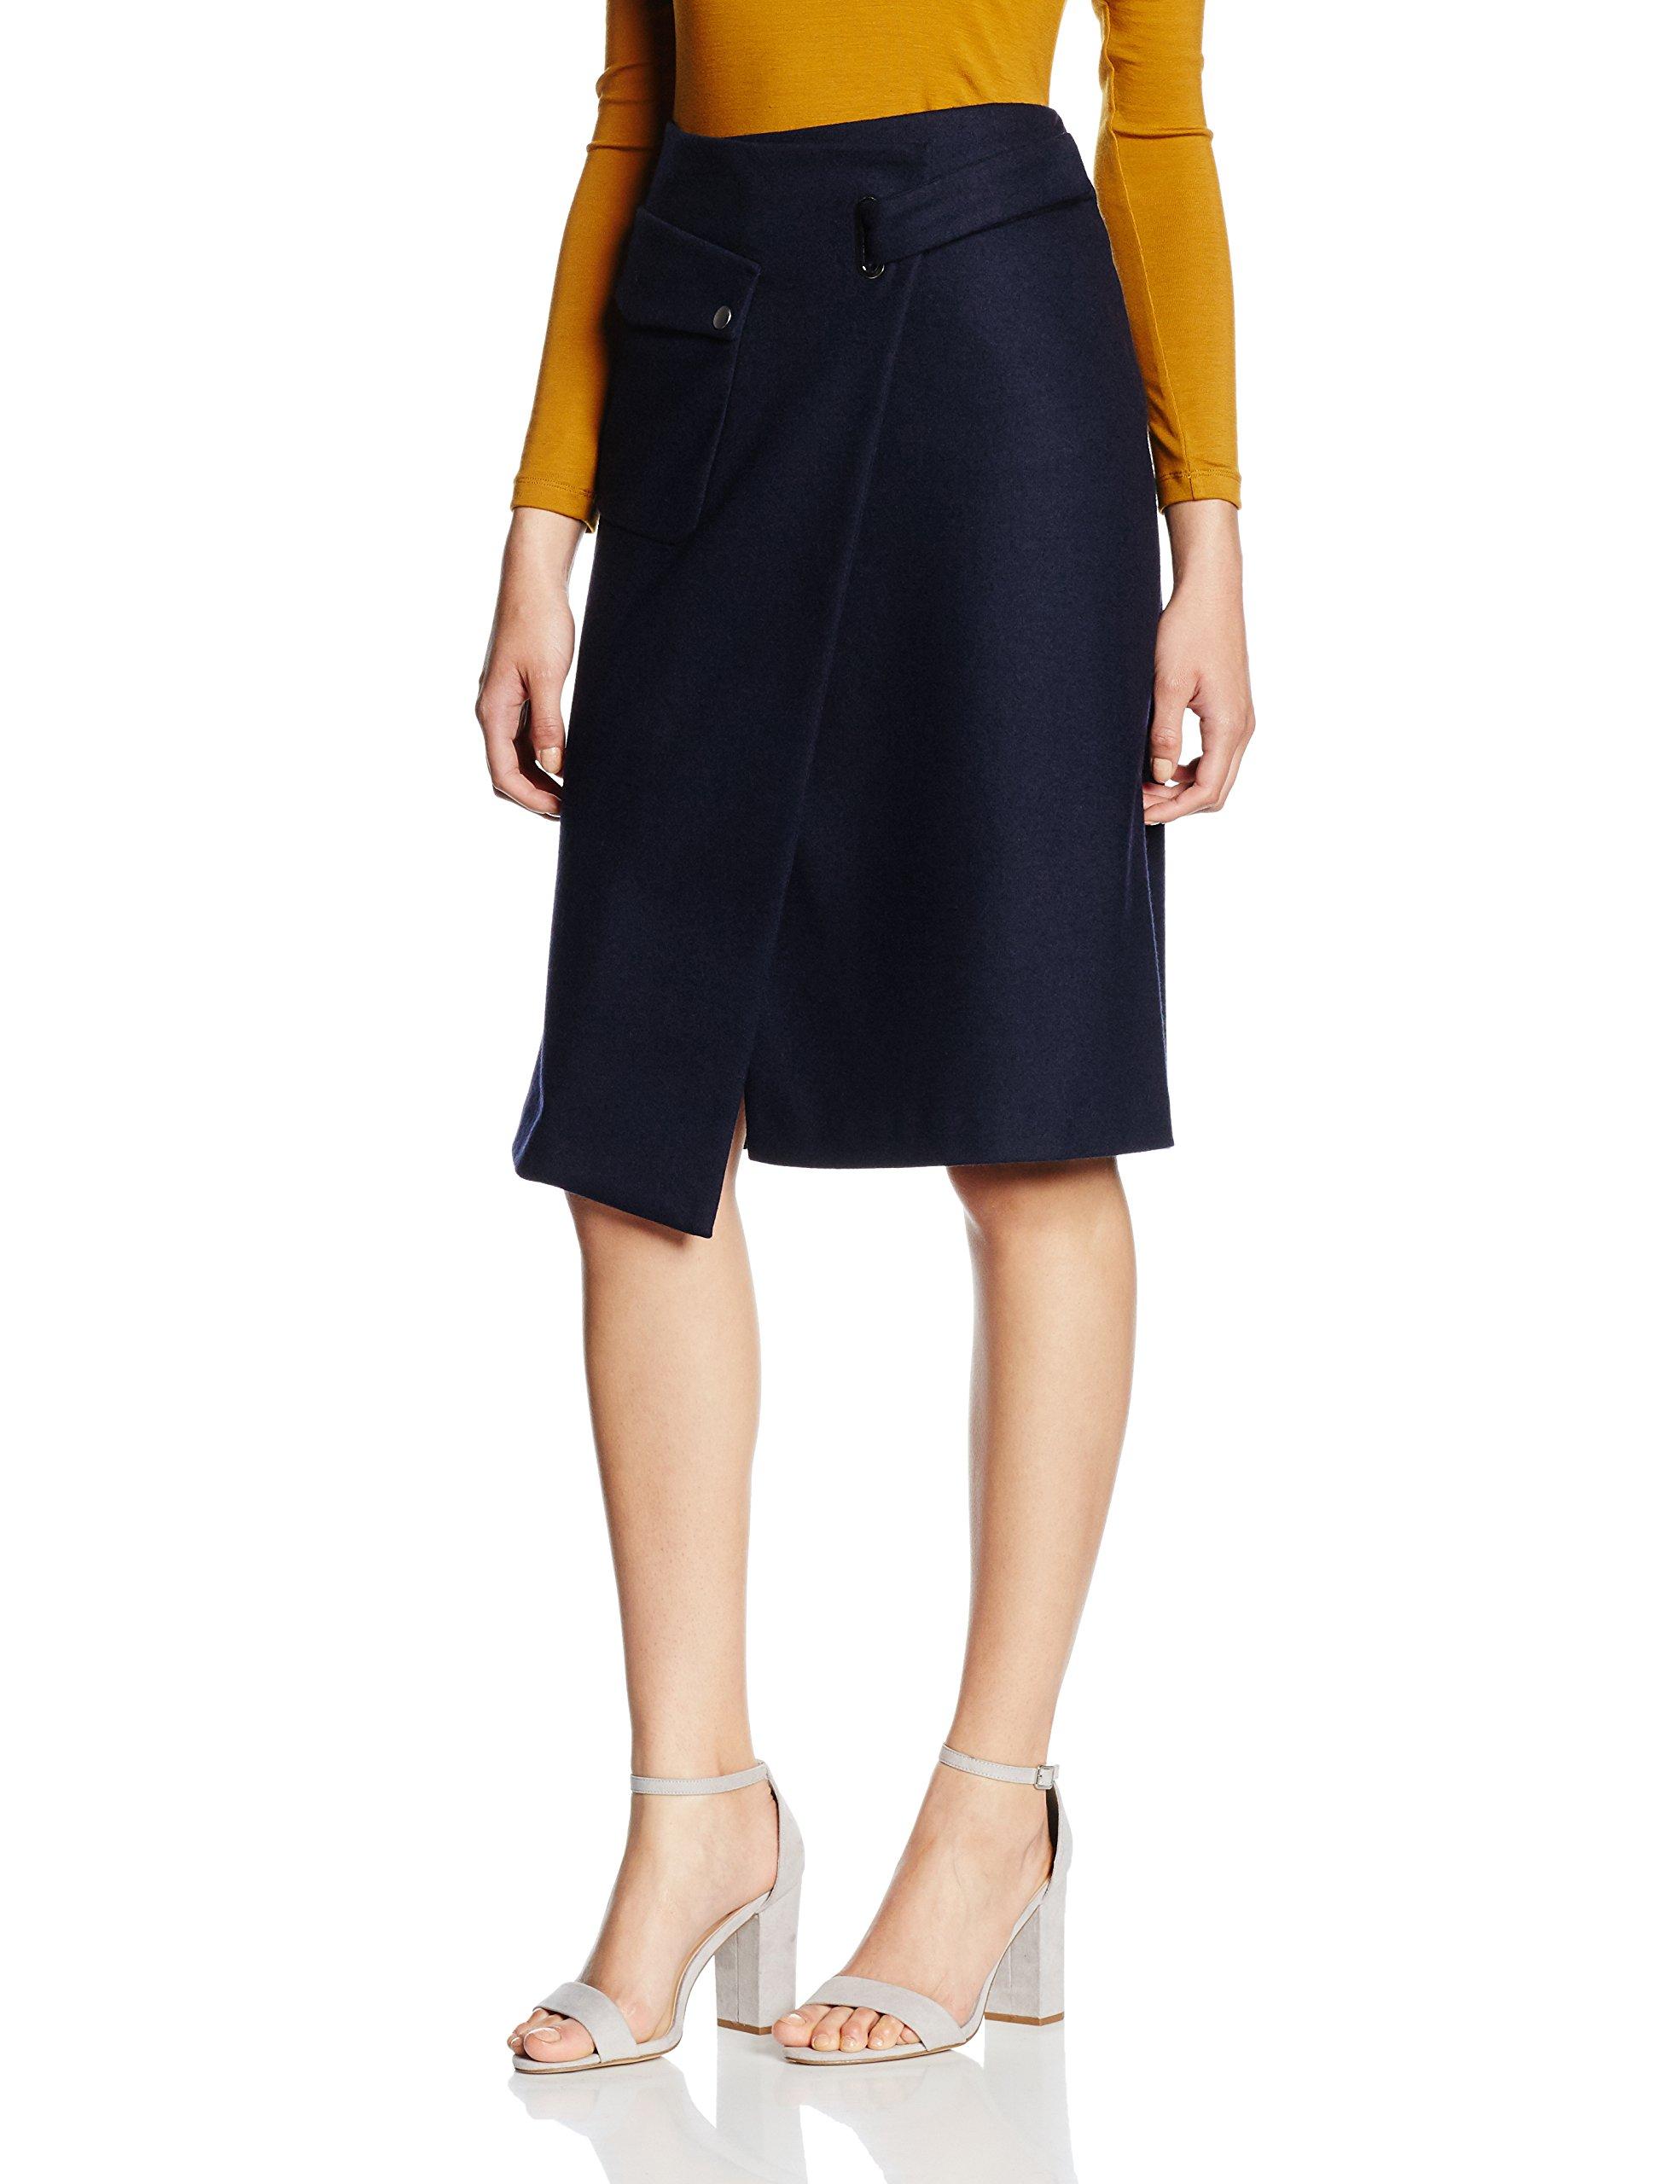 Filippa Wool Fabricant mediumFemme Wrap Skirt JupeBleunavy40taille Pocket K lcKF1J